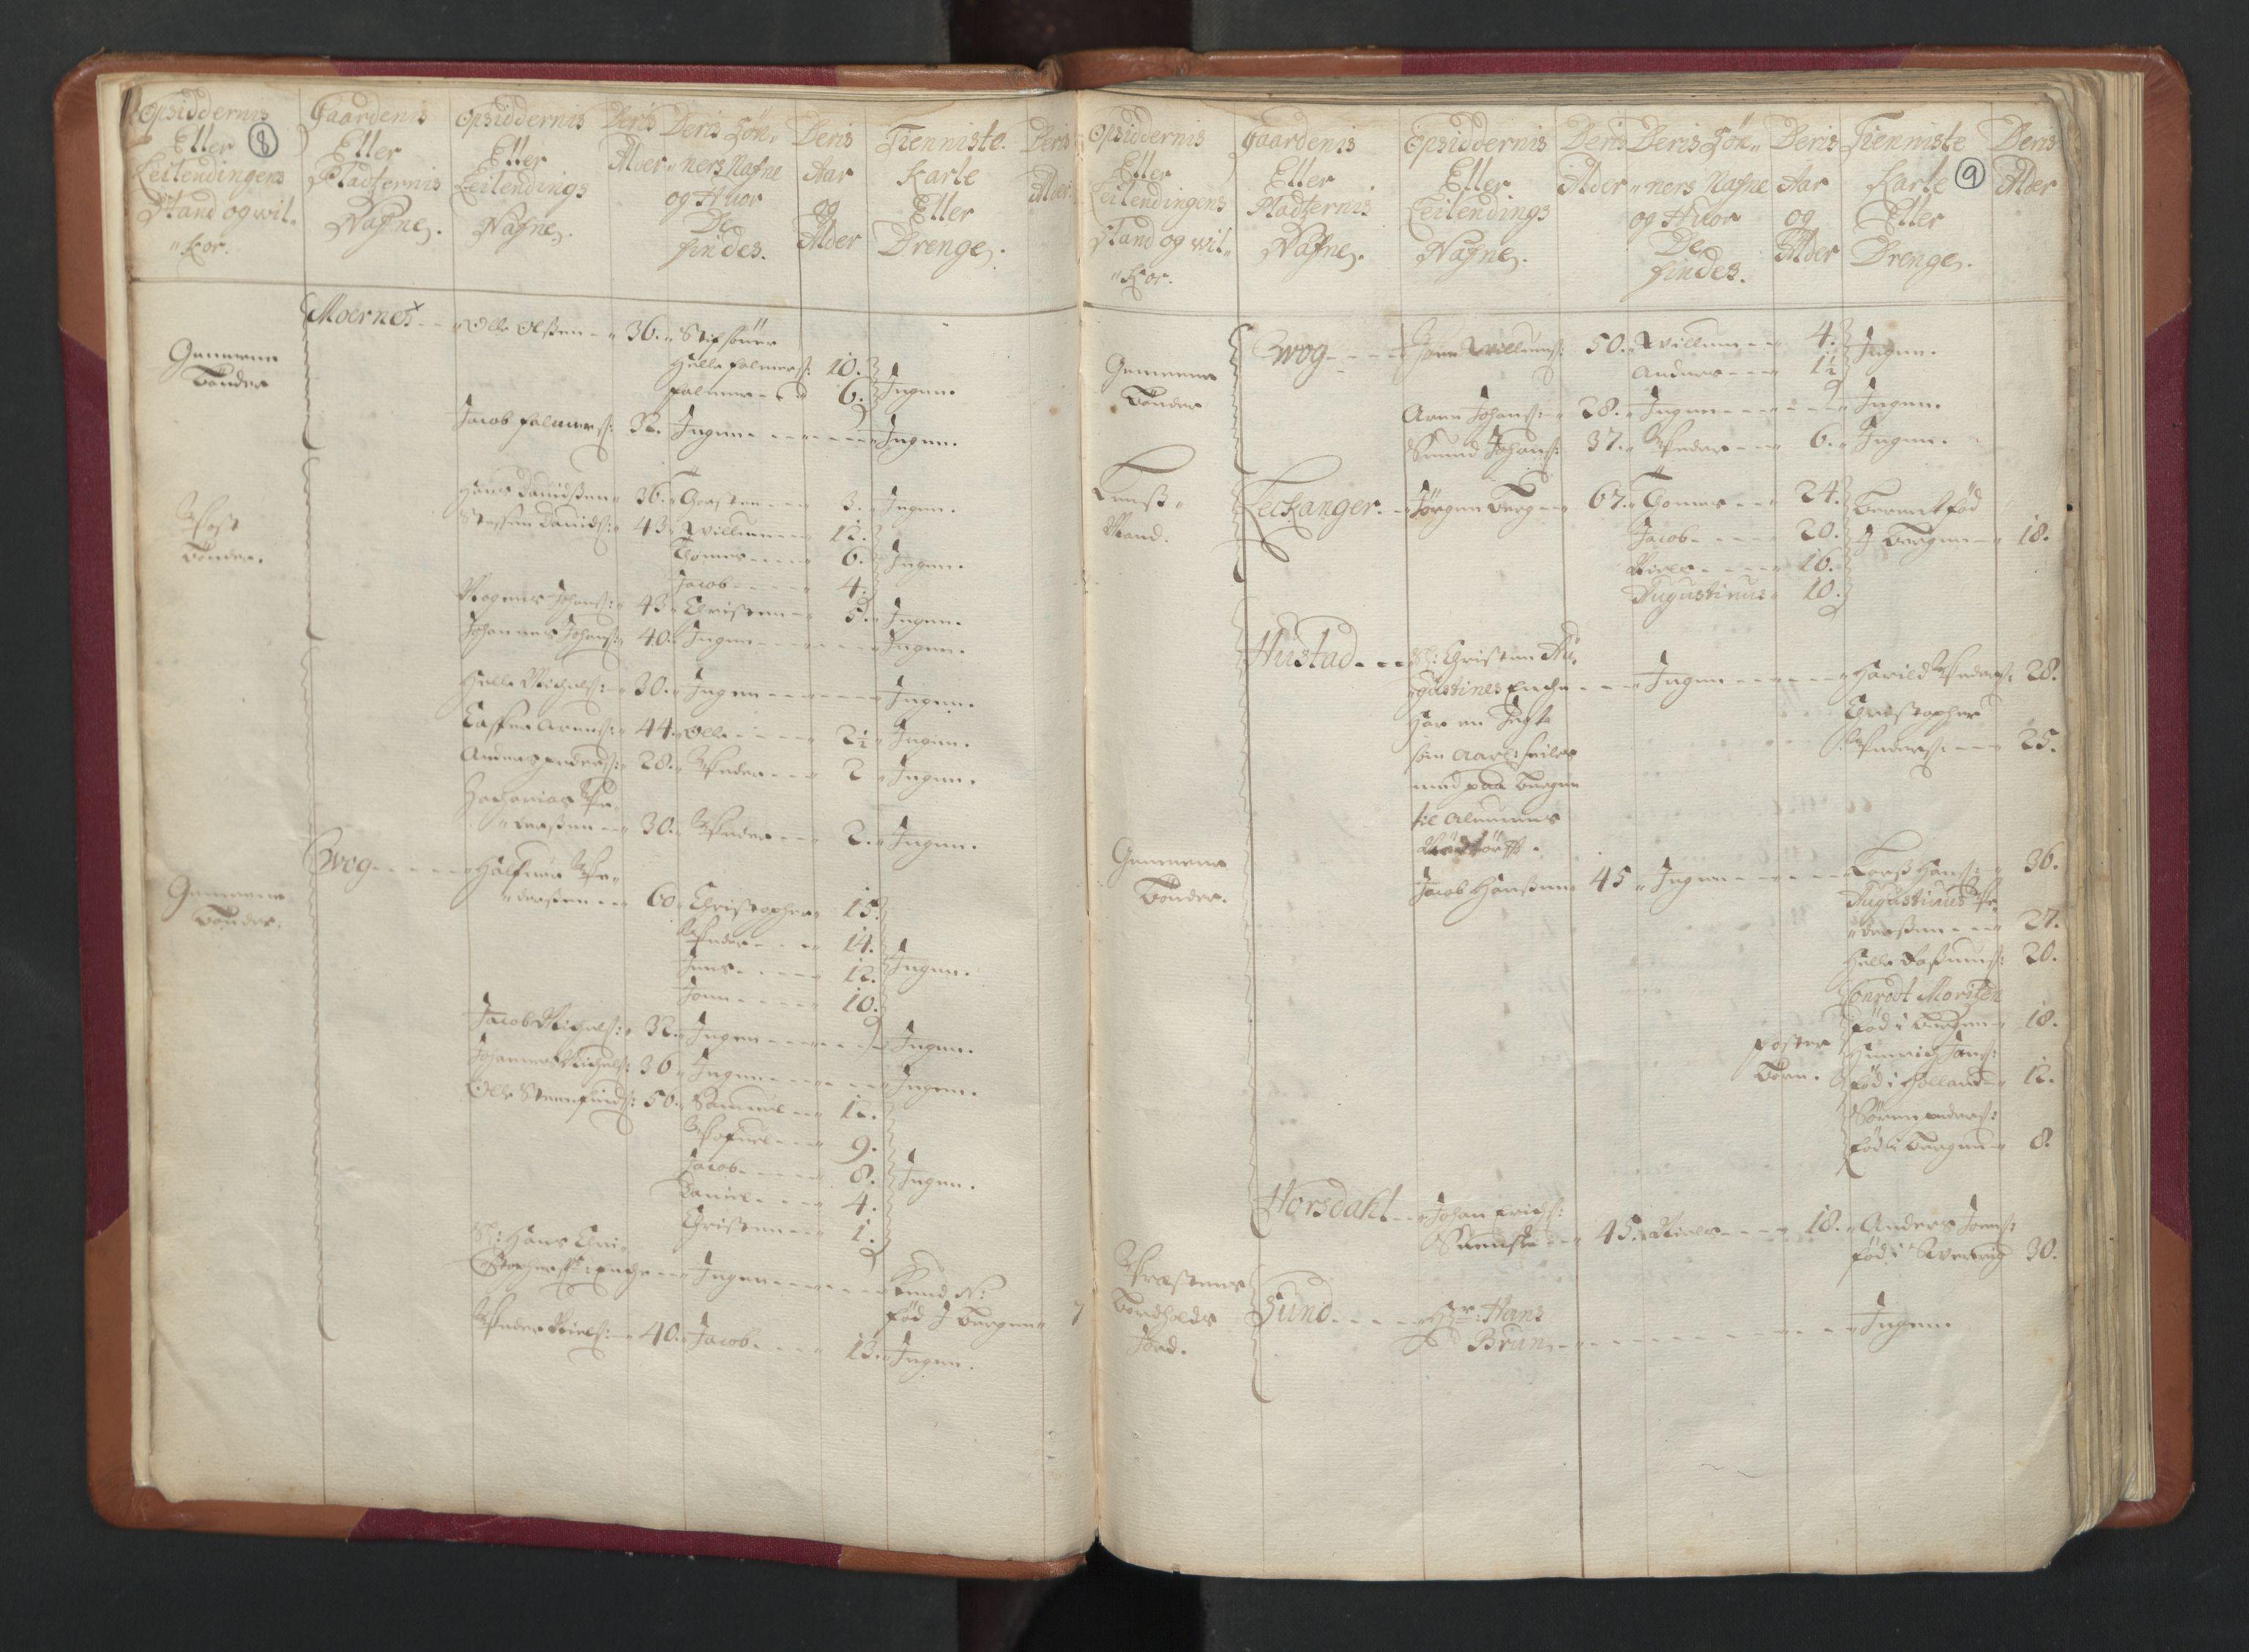 RA, Manntallet 1701, nr. 17: Salten fogderi, 1701, s. 8-9